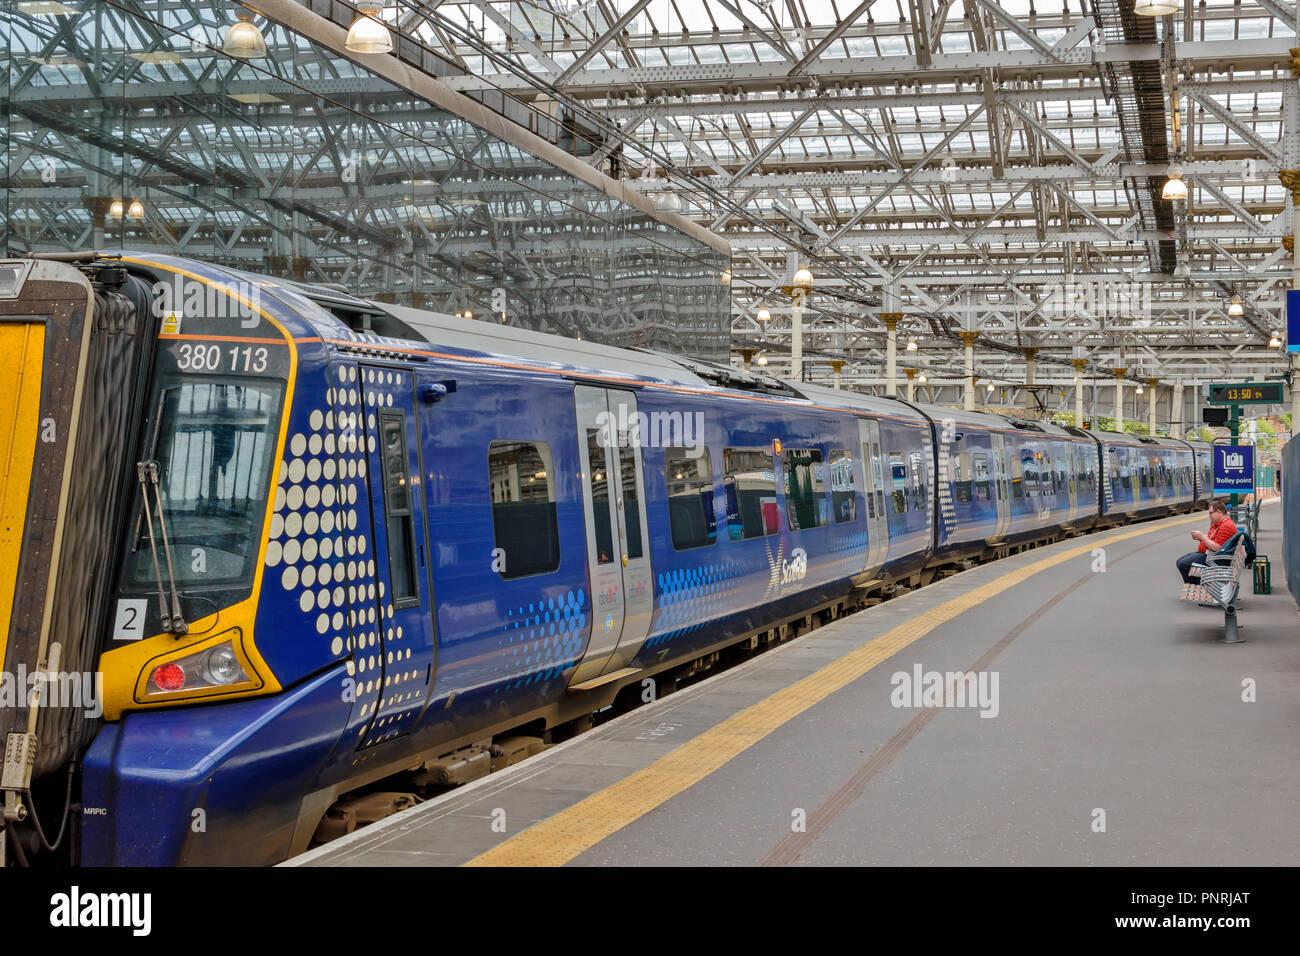 EDINBURGH SCOTLAND WAVERLEY STATION BLUE CARRIAGES OF SCOT RAIL TRAIN - Stock Image